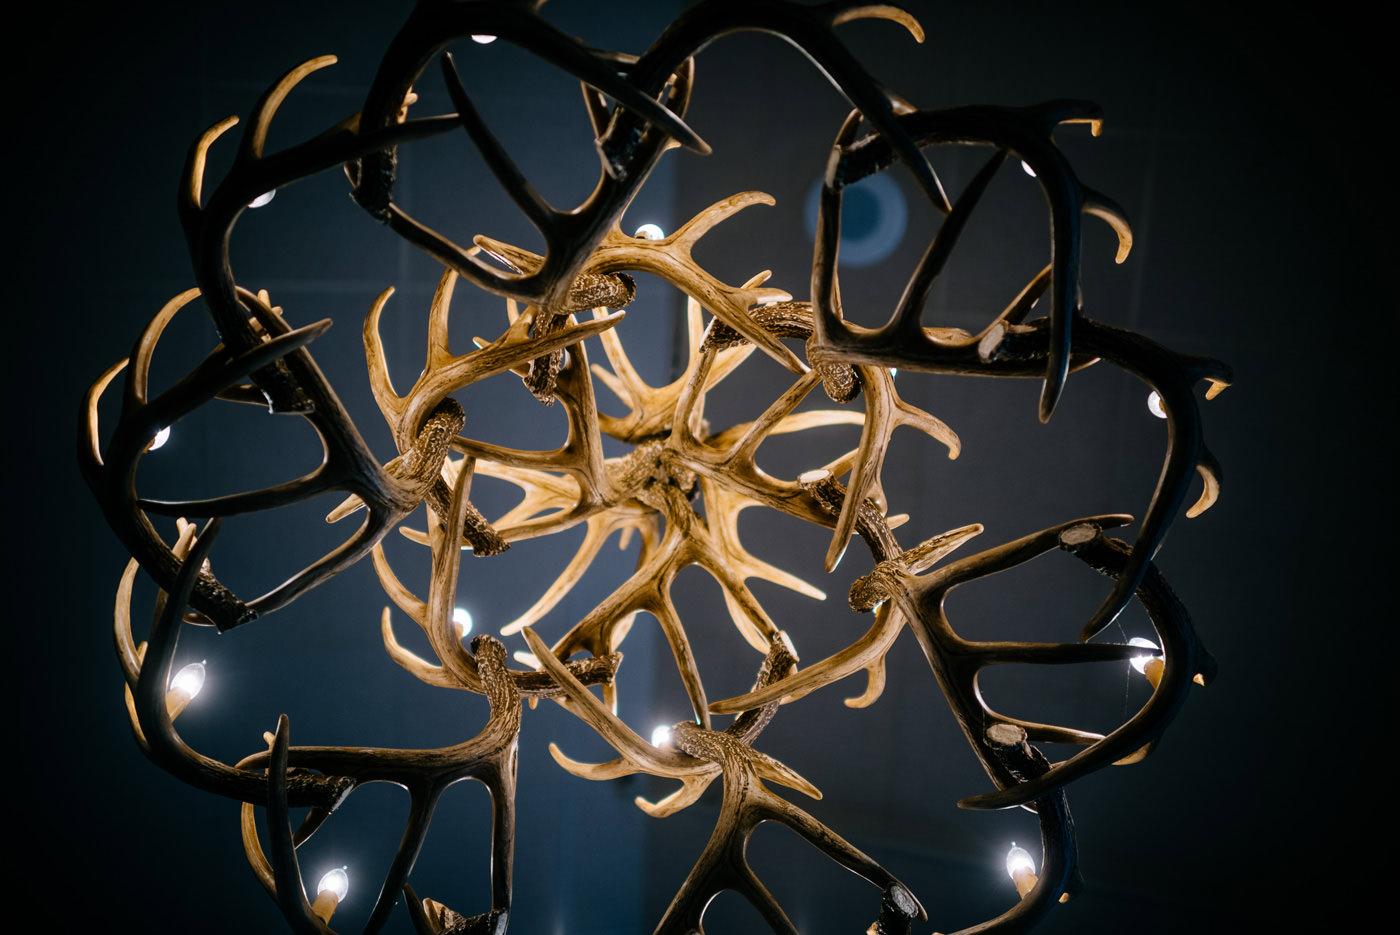 canaan valley resort state park bear paw lodge antler chandelier